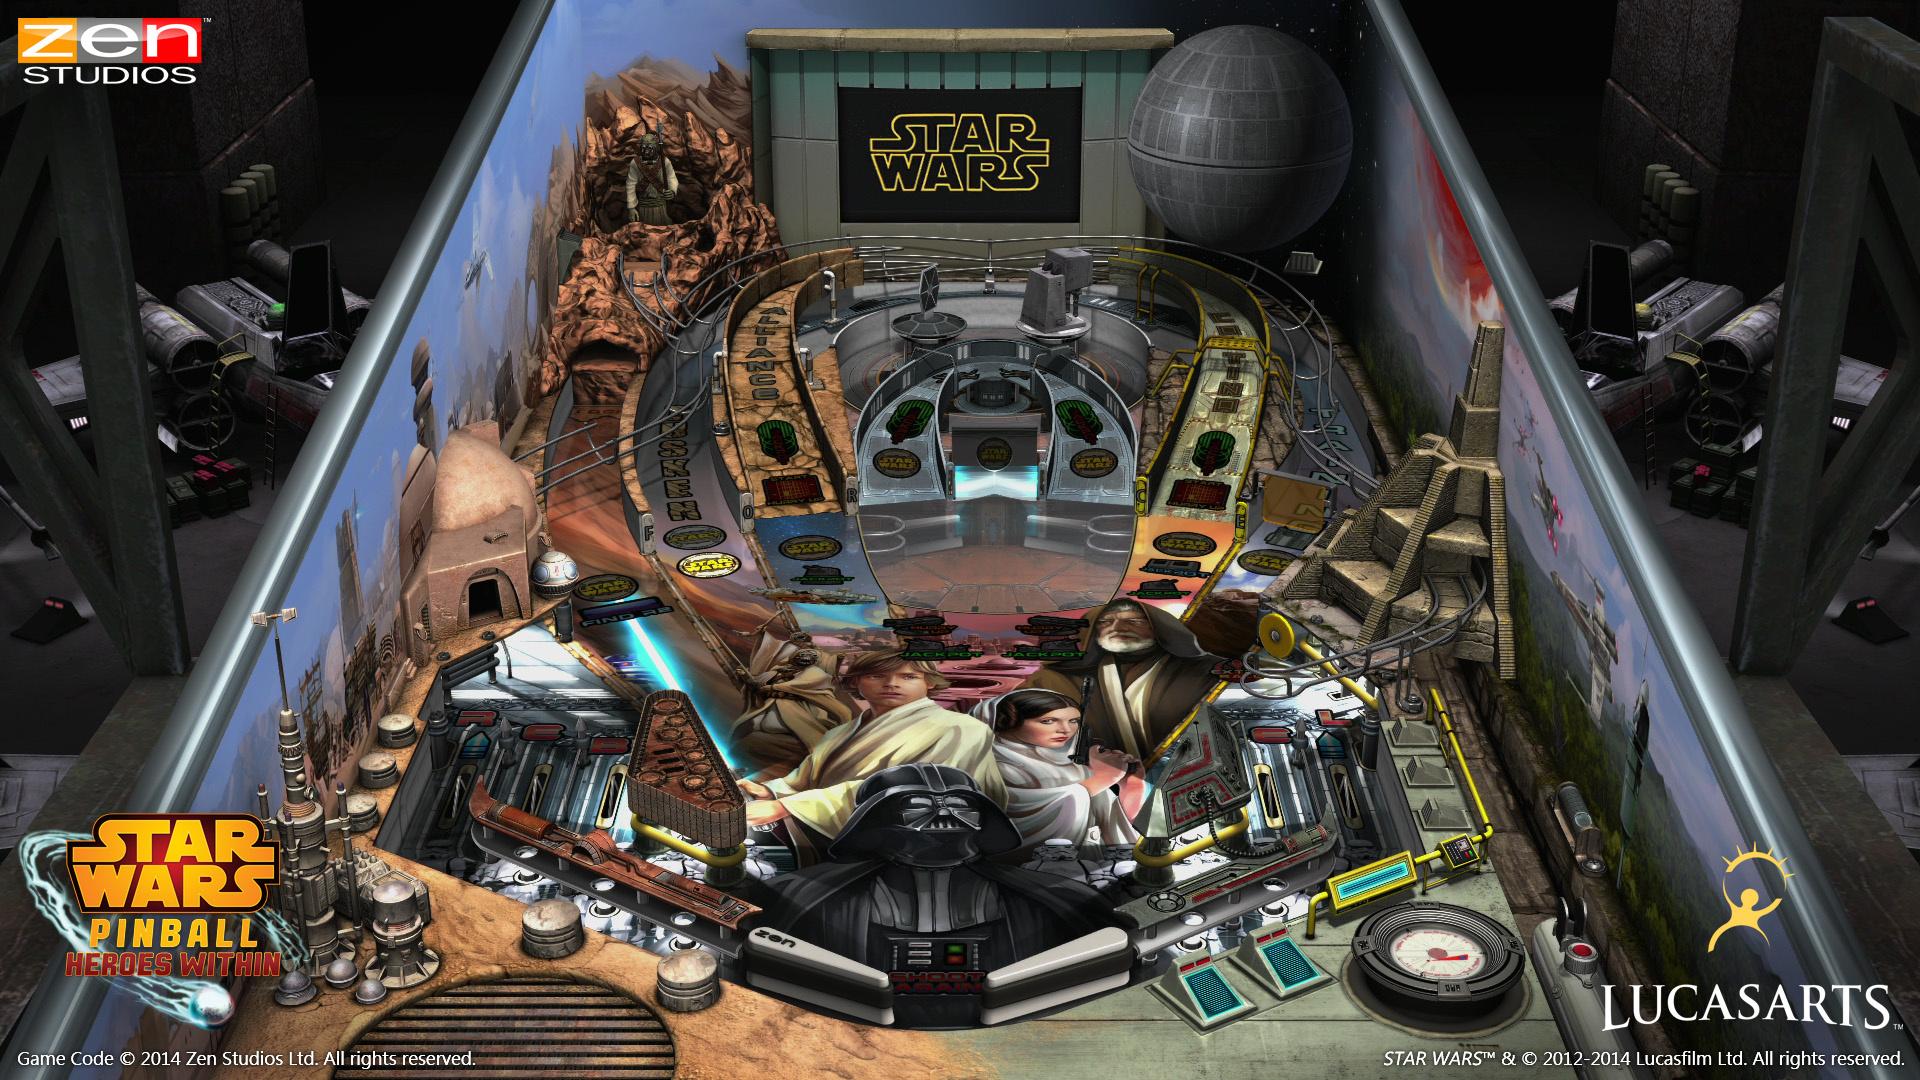 Star Wars Pinball Heroes Within Ps4 Playstation 4